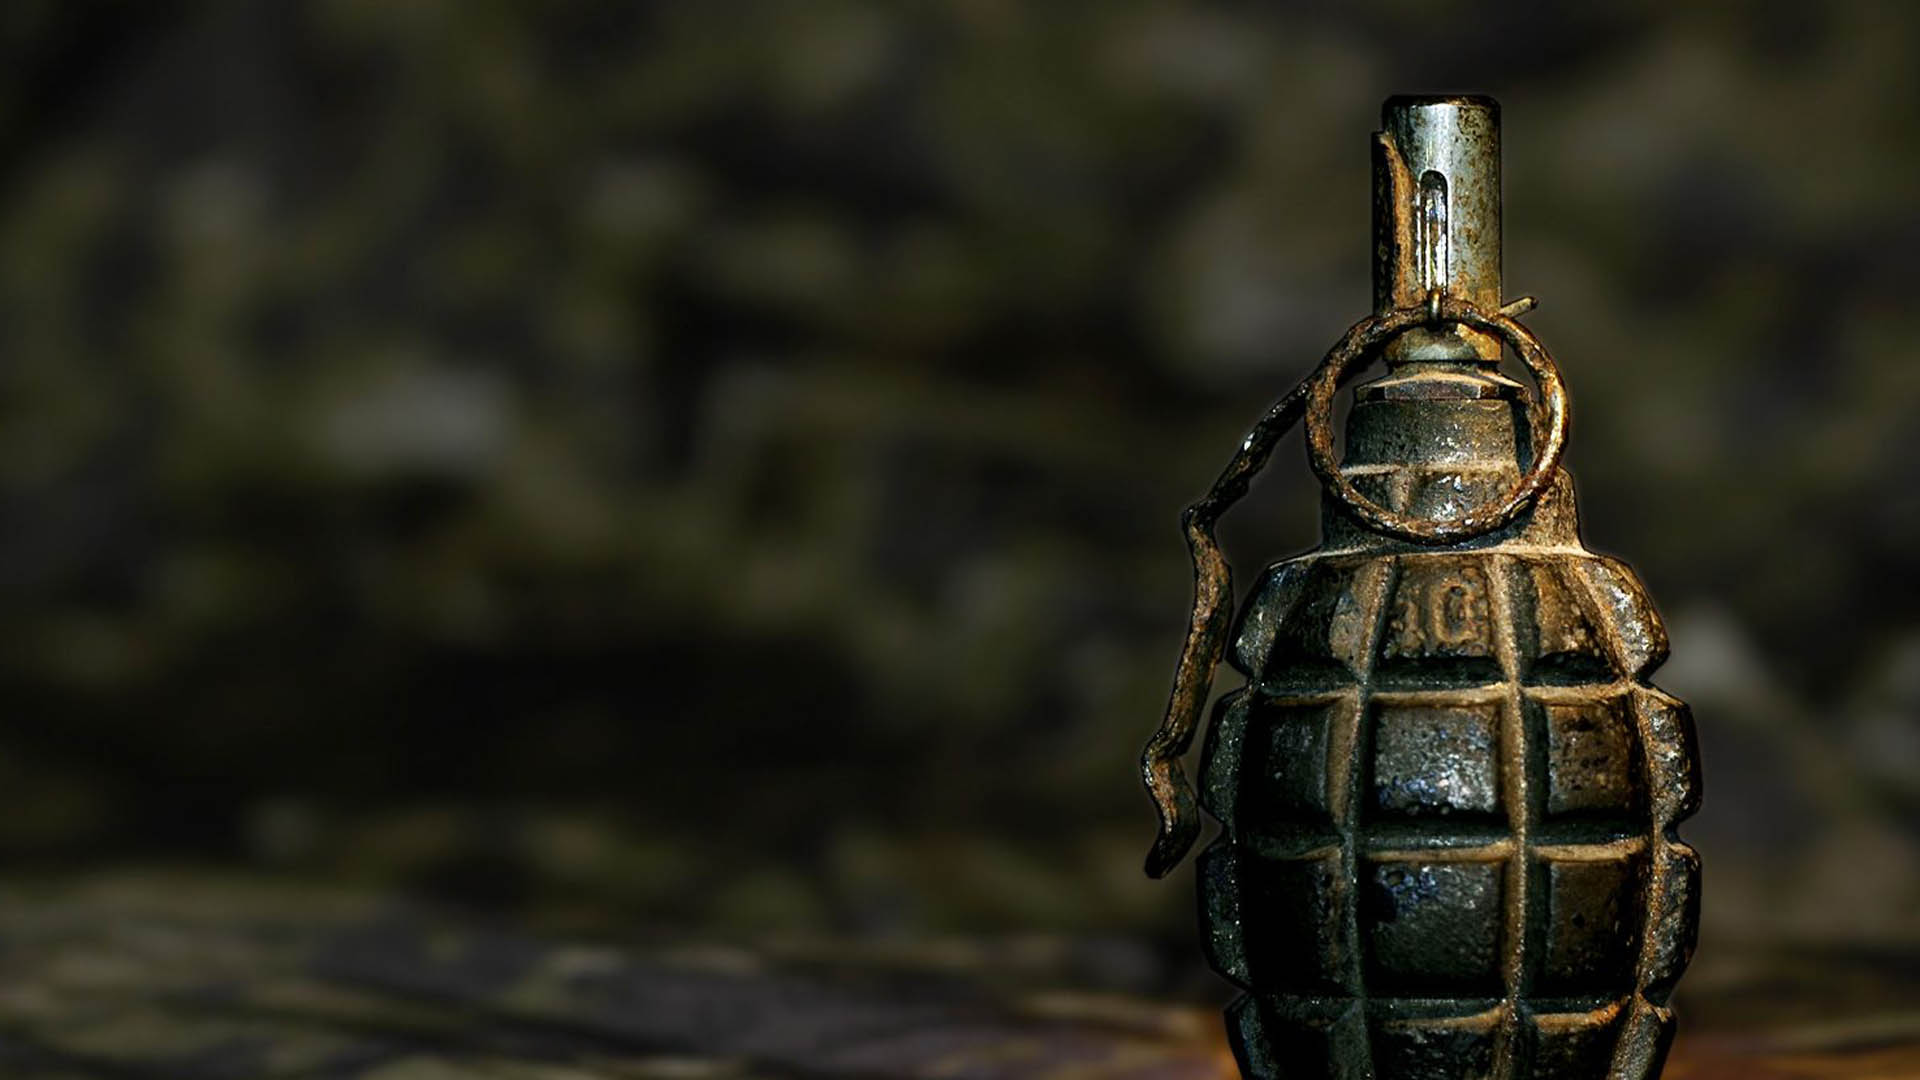 La granada estalló frente a una iglesia católica durante la misa en la ciudad de Midsayap, cerca de la capital